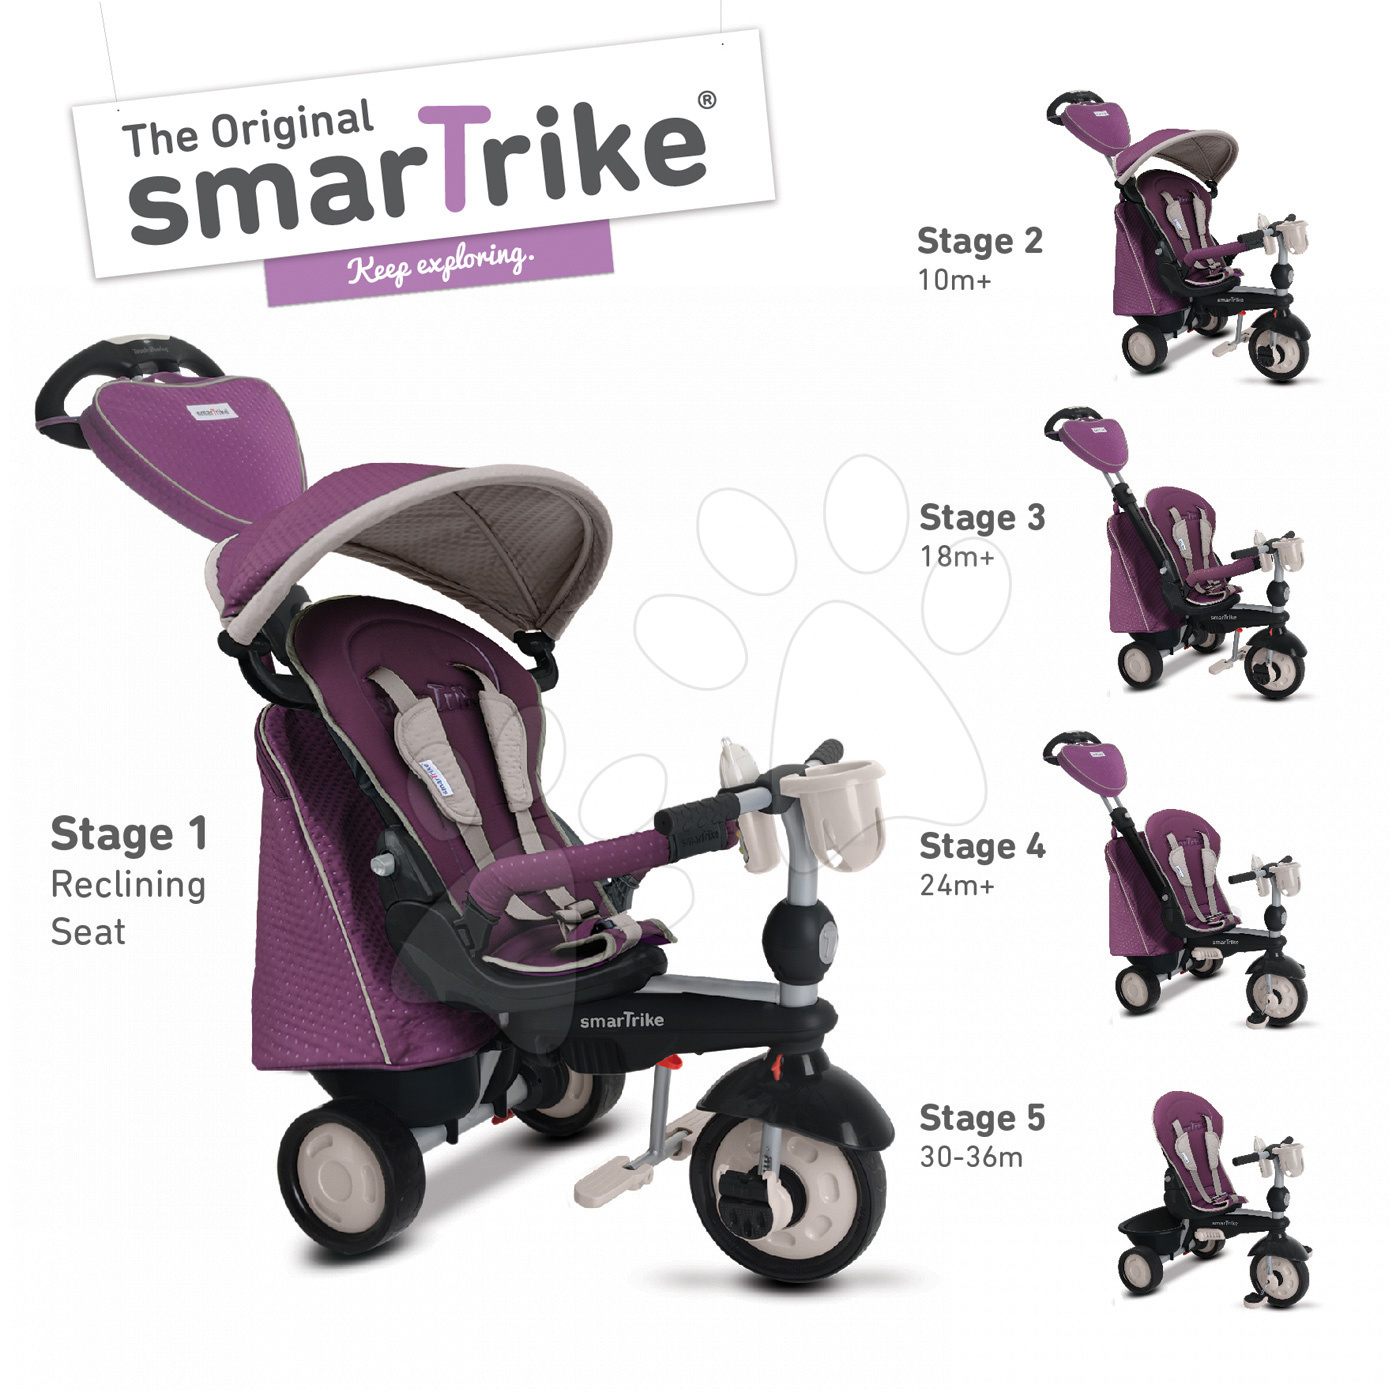 Trojkolka Recliner Infinity Purple smarTrike 5v1 TouchSteering fialovo-šedá od 10 mes